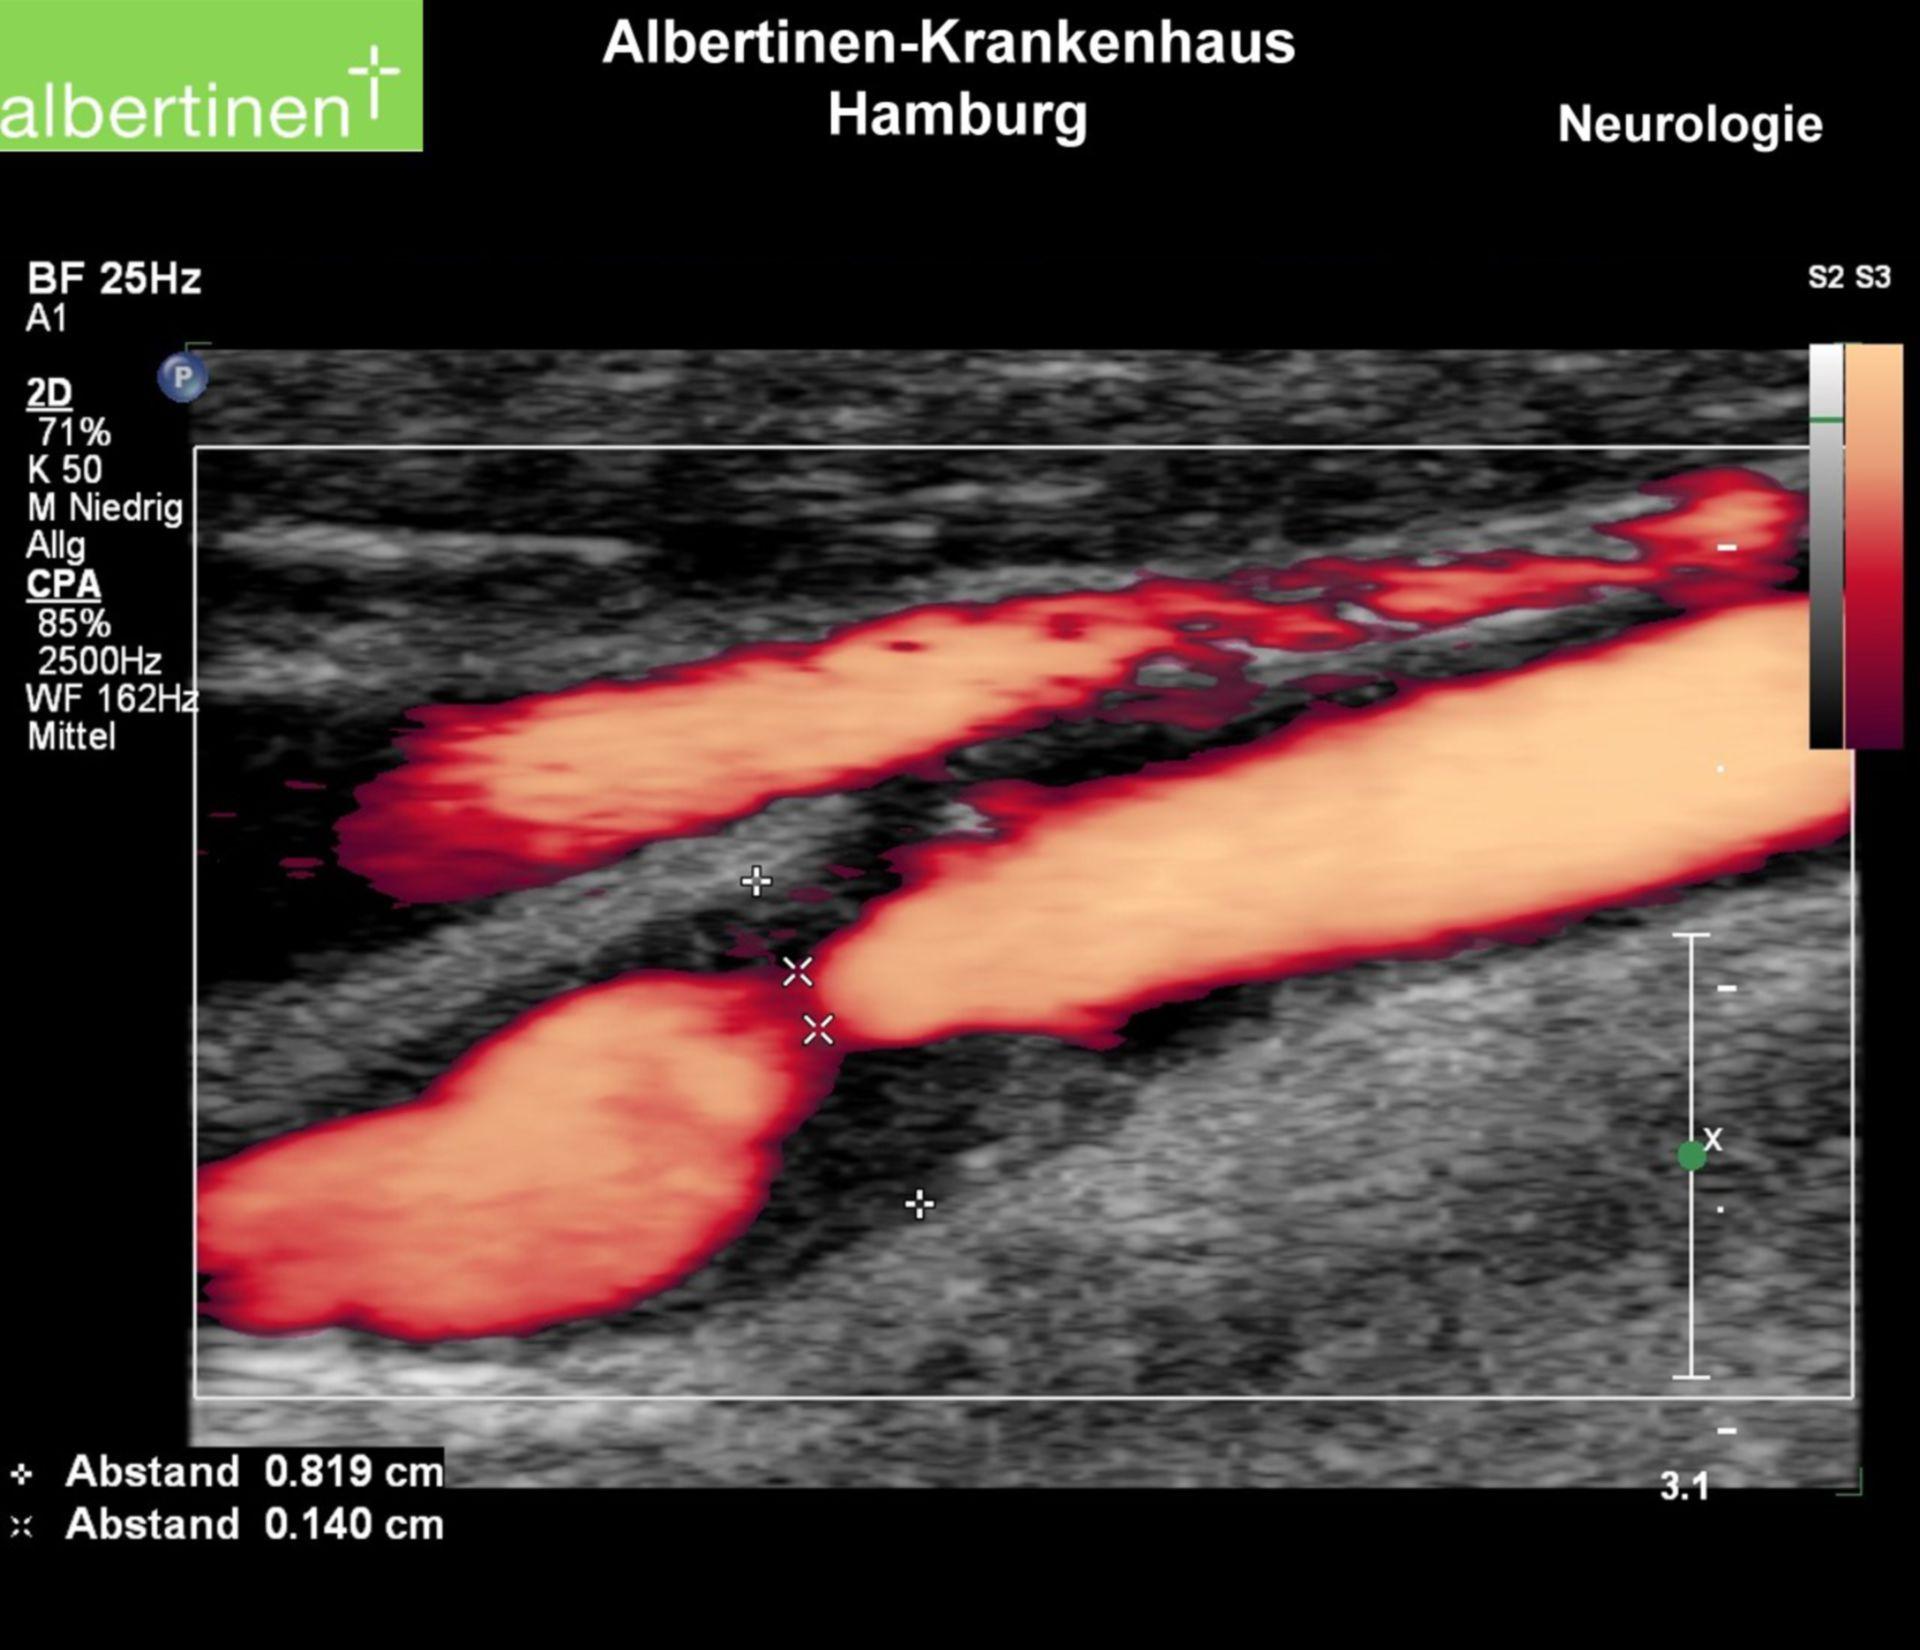 Duplex ultrasonography: stenosis of the right carotid artery